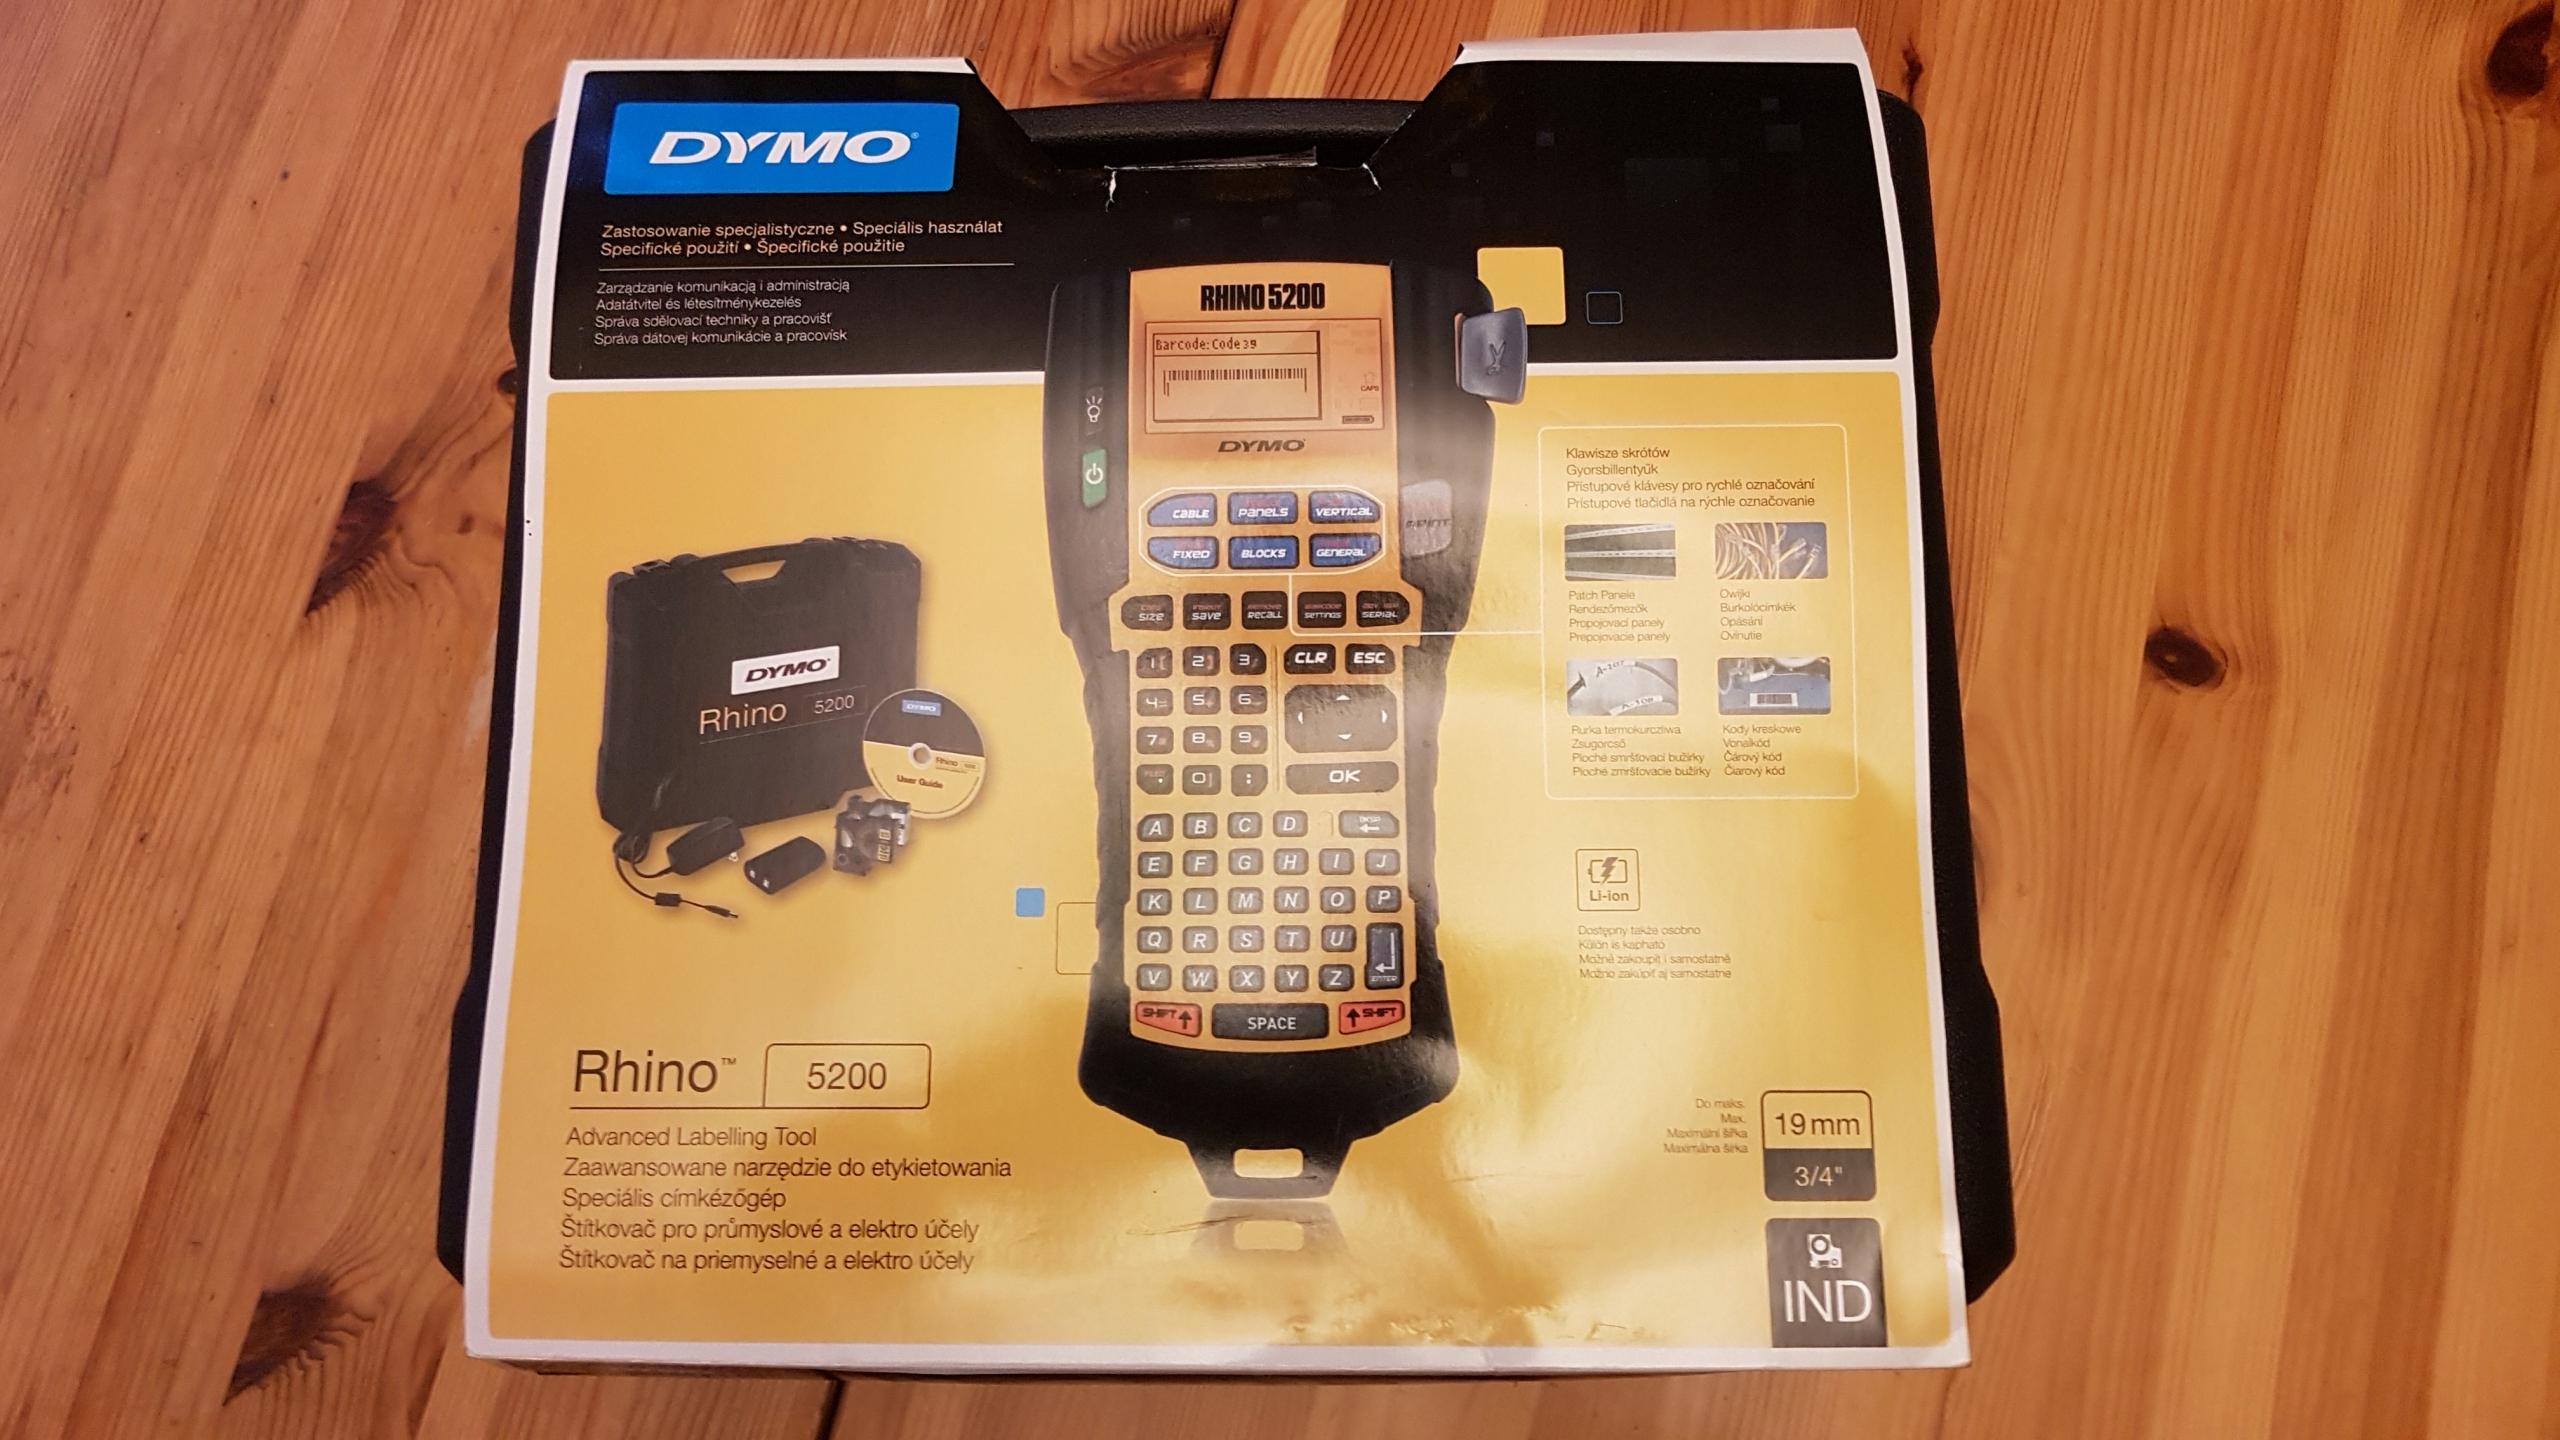 DYMO , DRUKARKA ETYKIET DYMO , RHINO 5200